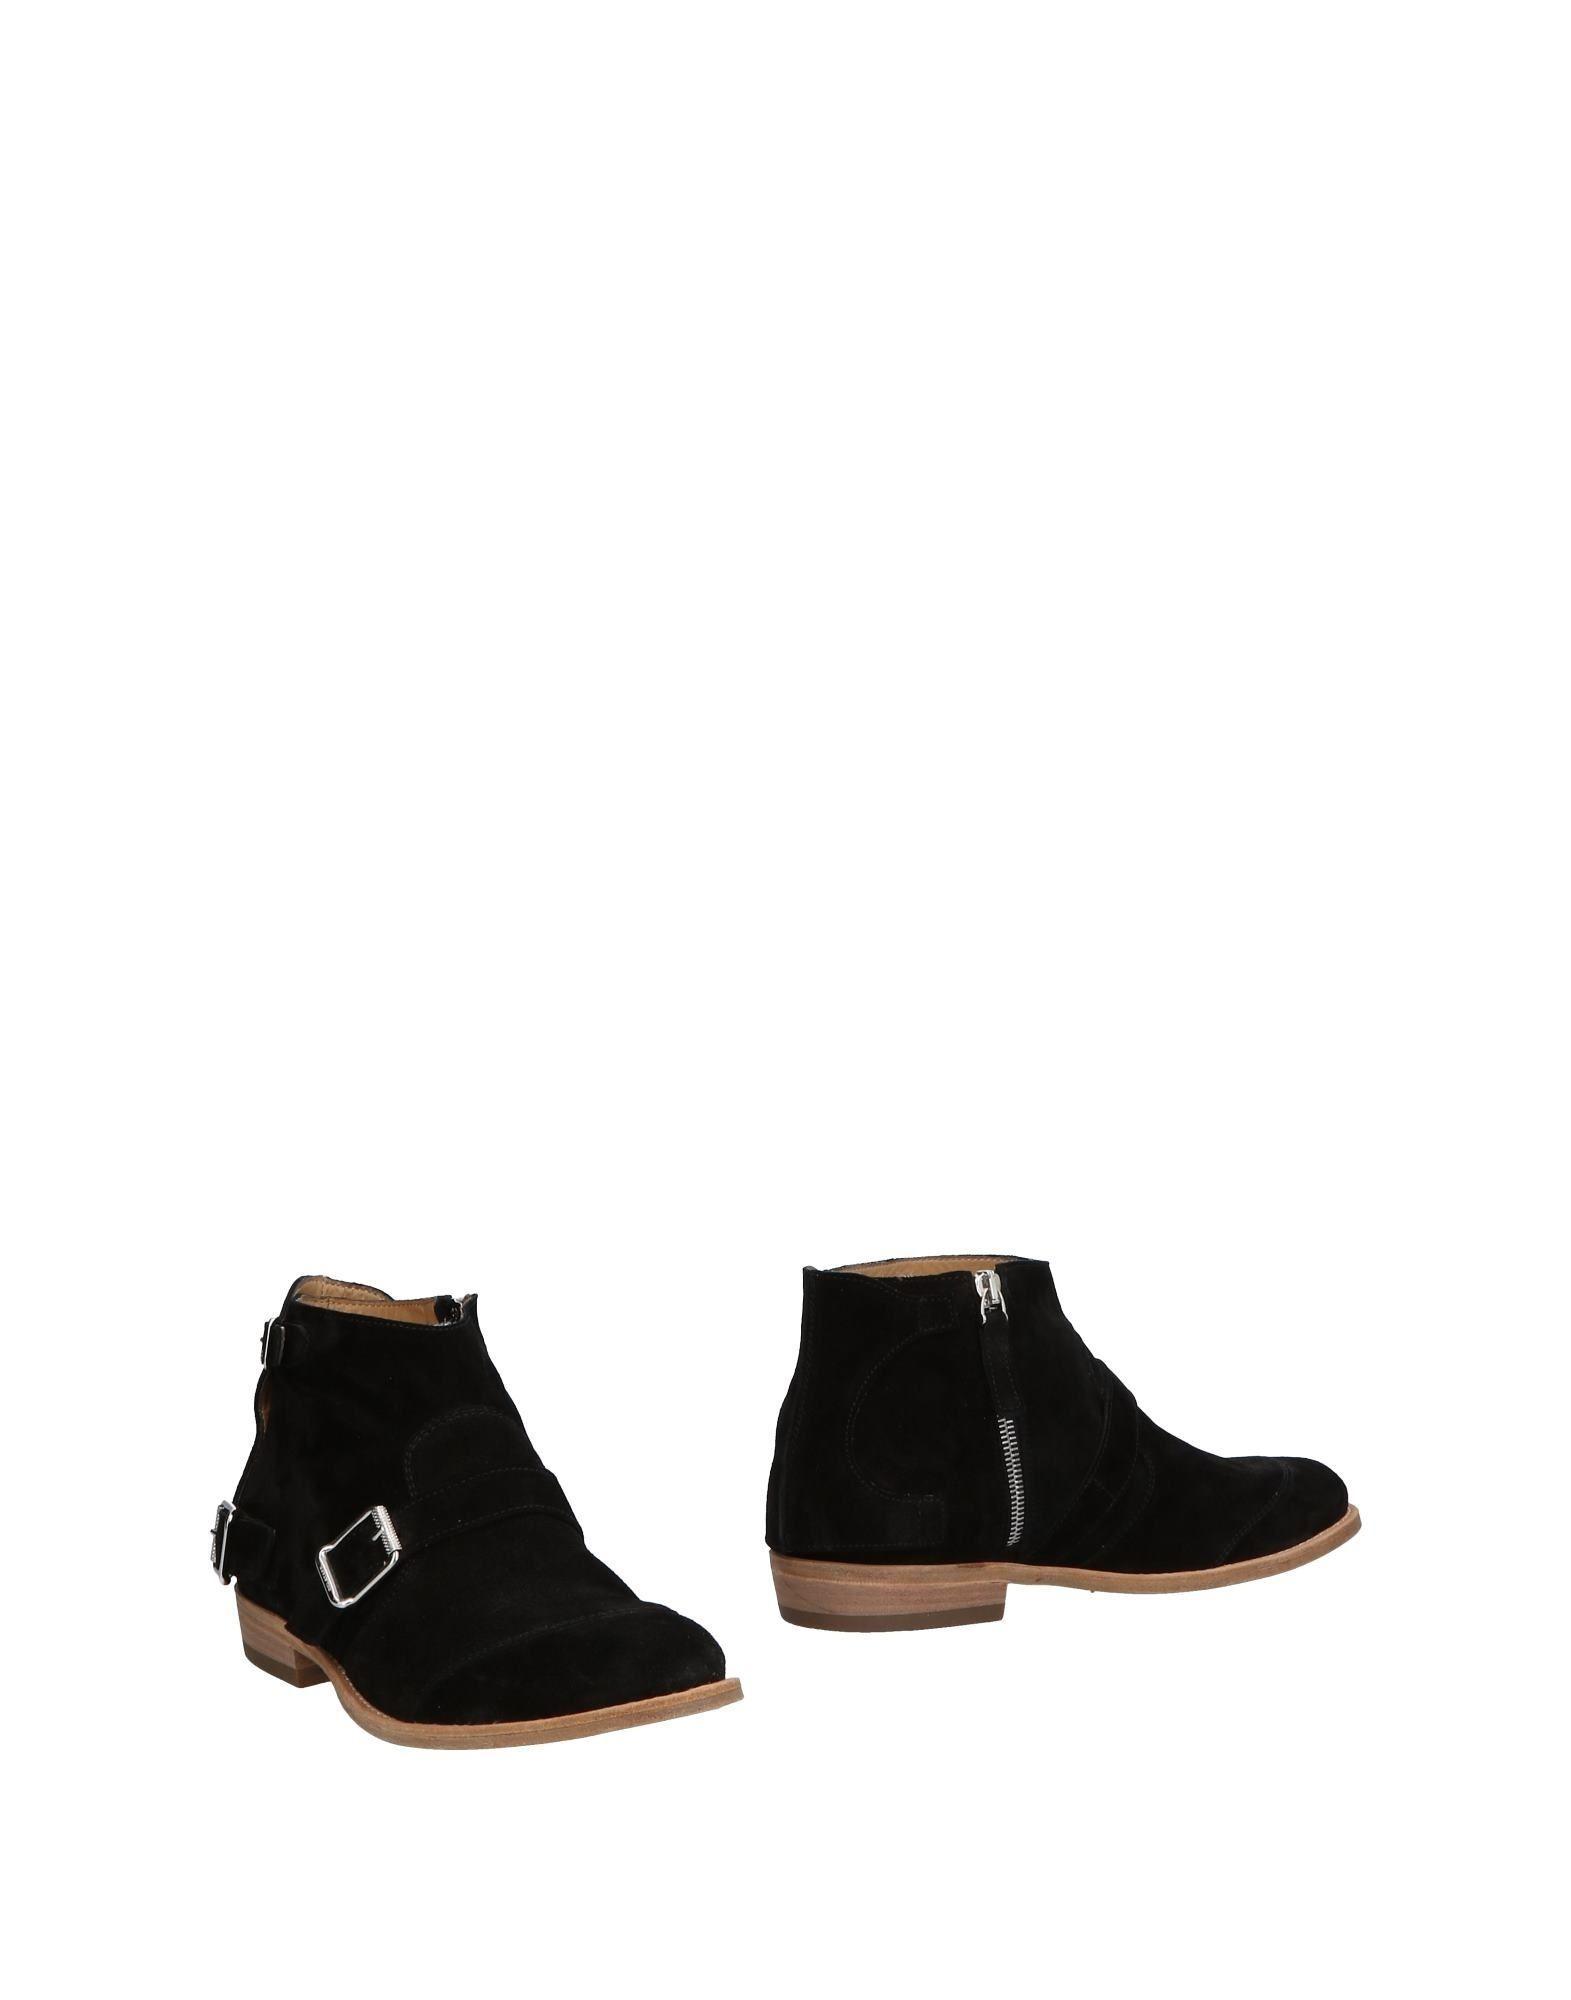 Belstaff Ankle Boot In Black